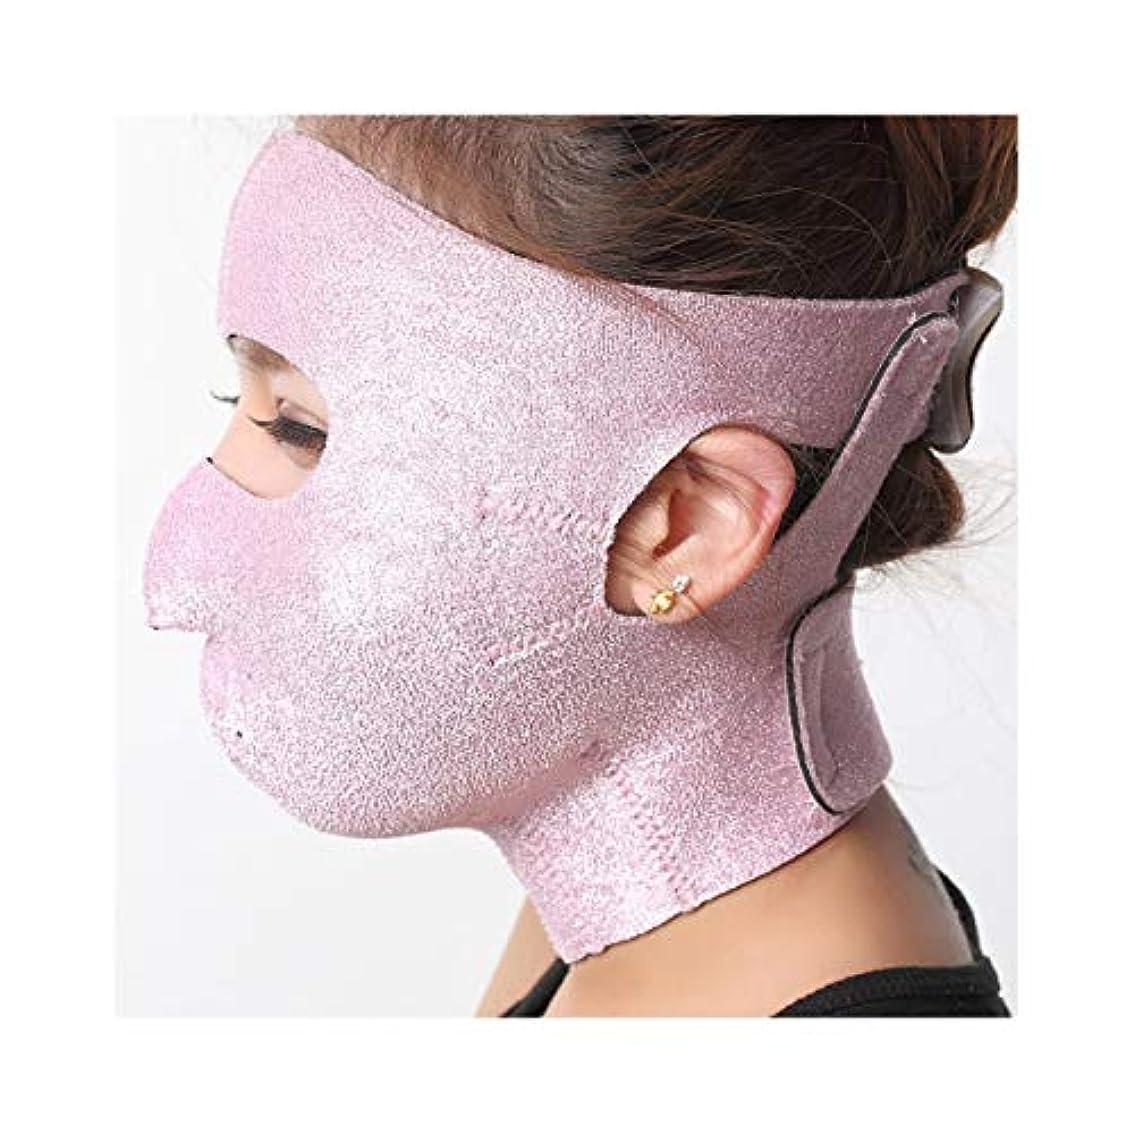 XHLMRMJ 引き締めフェイスマスク、小さなVフェイスアーティファクト睡眠薄いフェイス包帯マスクリフティングマスク引き締めクリームフェイスリフトフェイスメロンフェイス楽器